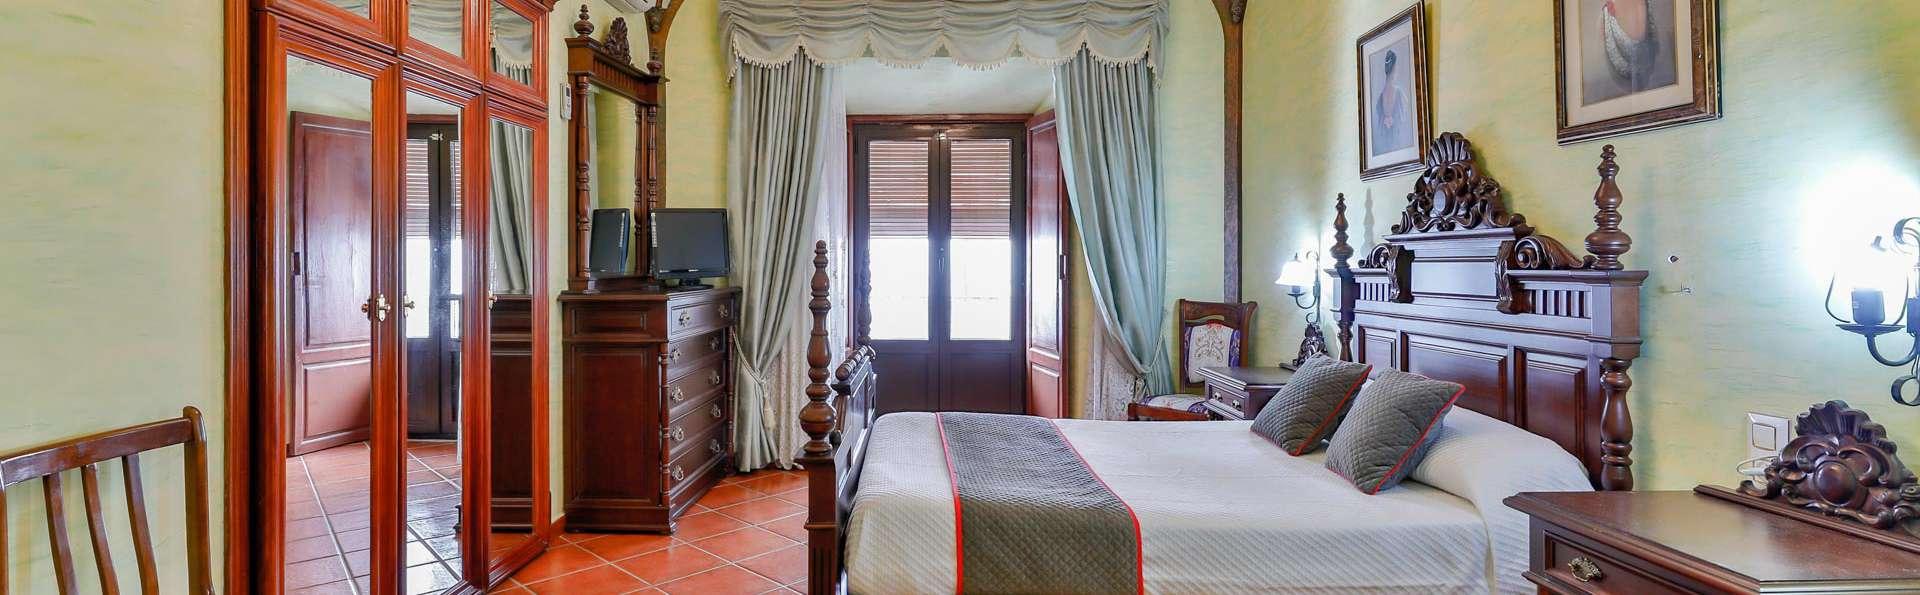 Hotel Las Palmeras by Vivere Stays - EDIT_DOUBLE_01.jpg